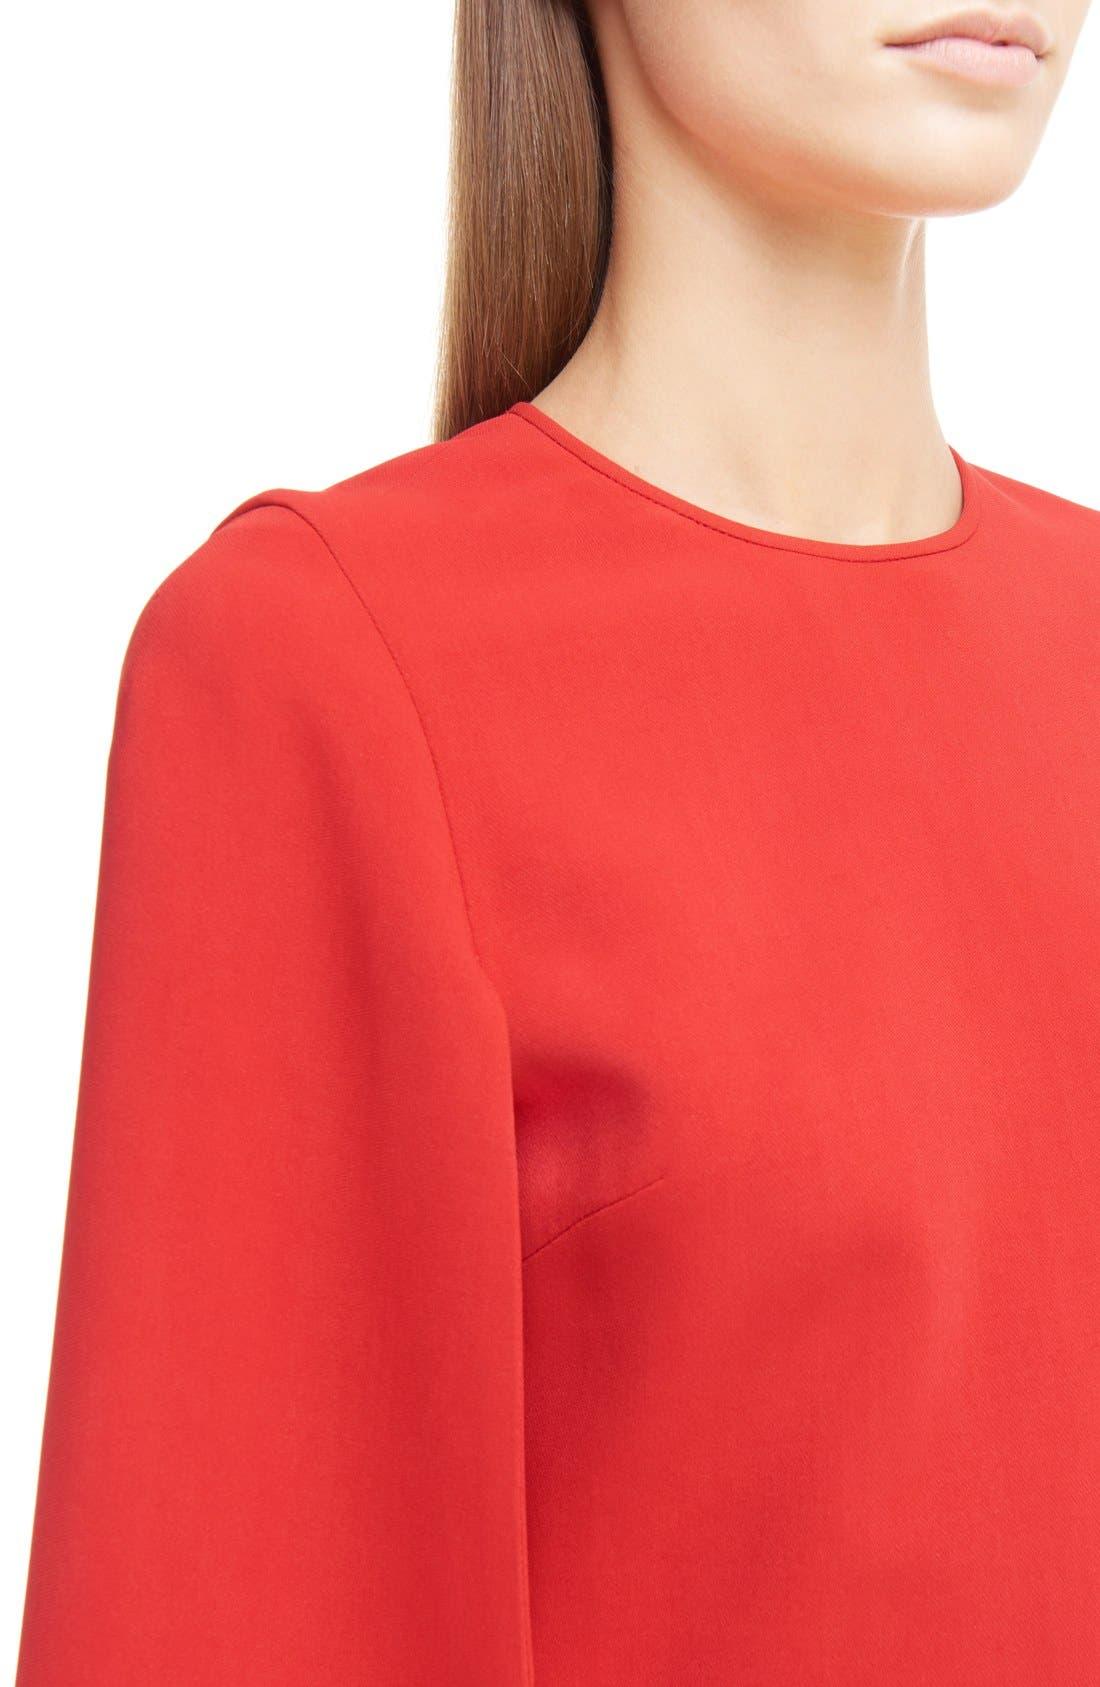 GIVENCHY,                             Cape Sleeve Dress,                             Alternate thumbnail 5, color,                             600